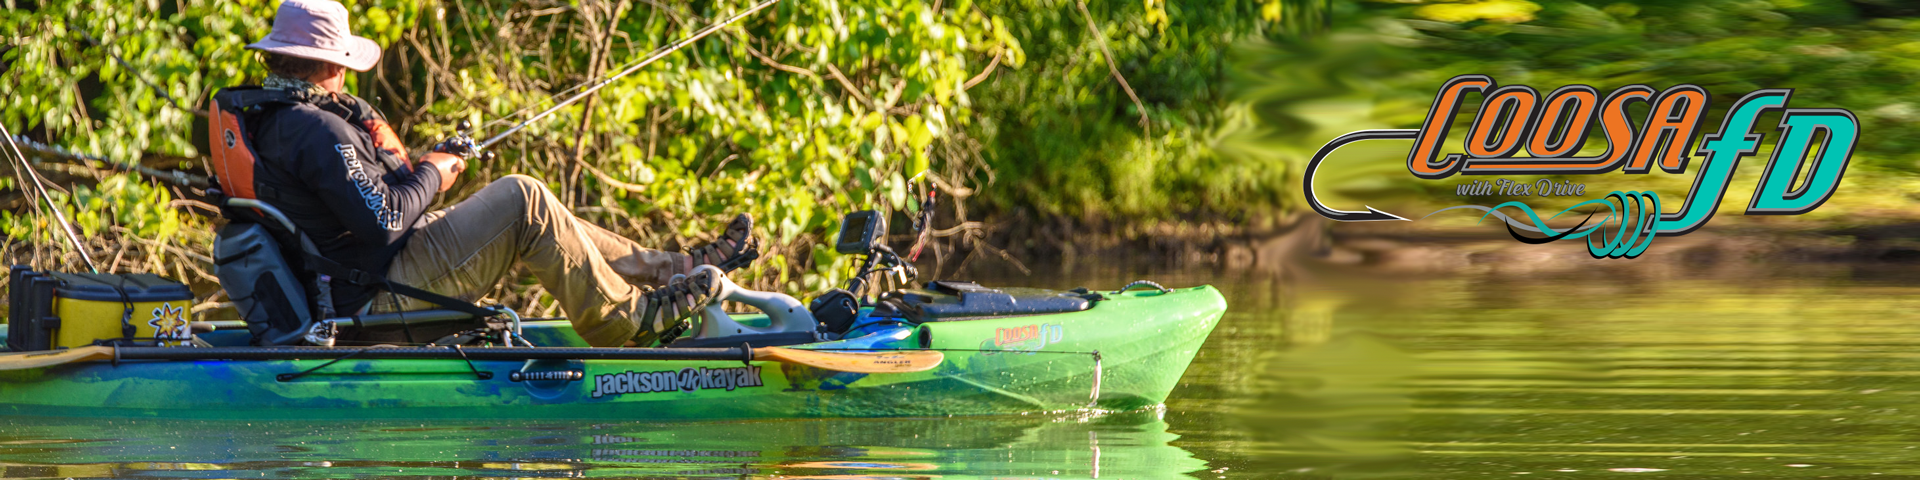 Kayaks: Coosa FD by Jackson Kayak - Image 4659